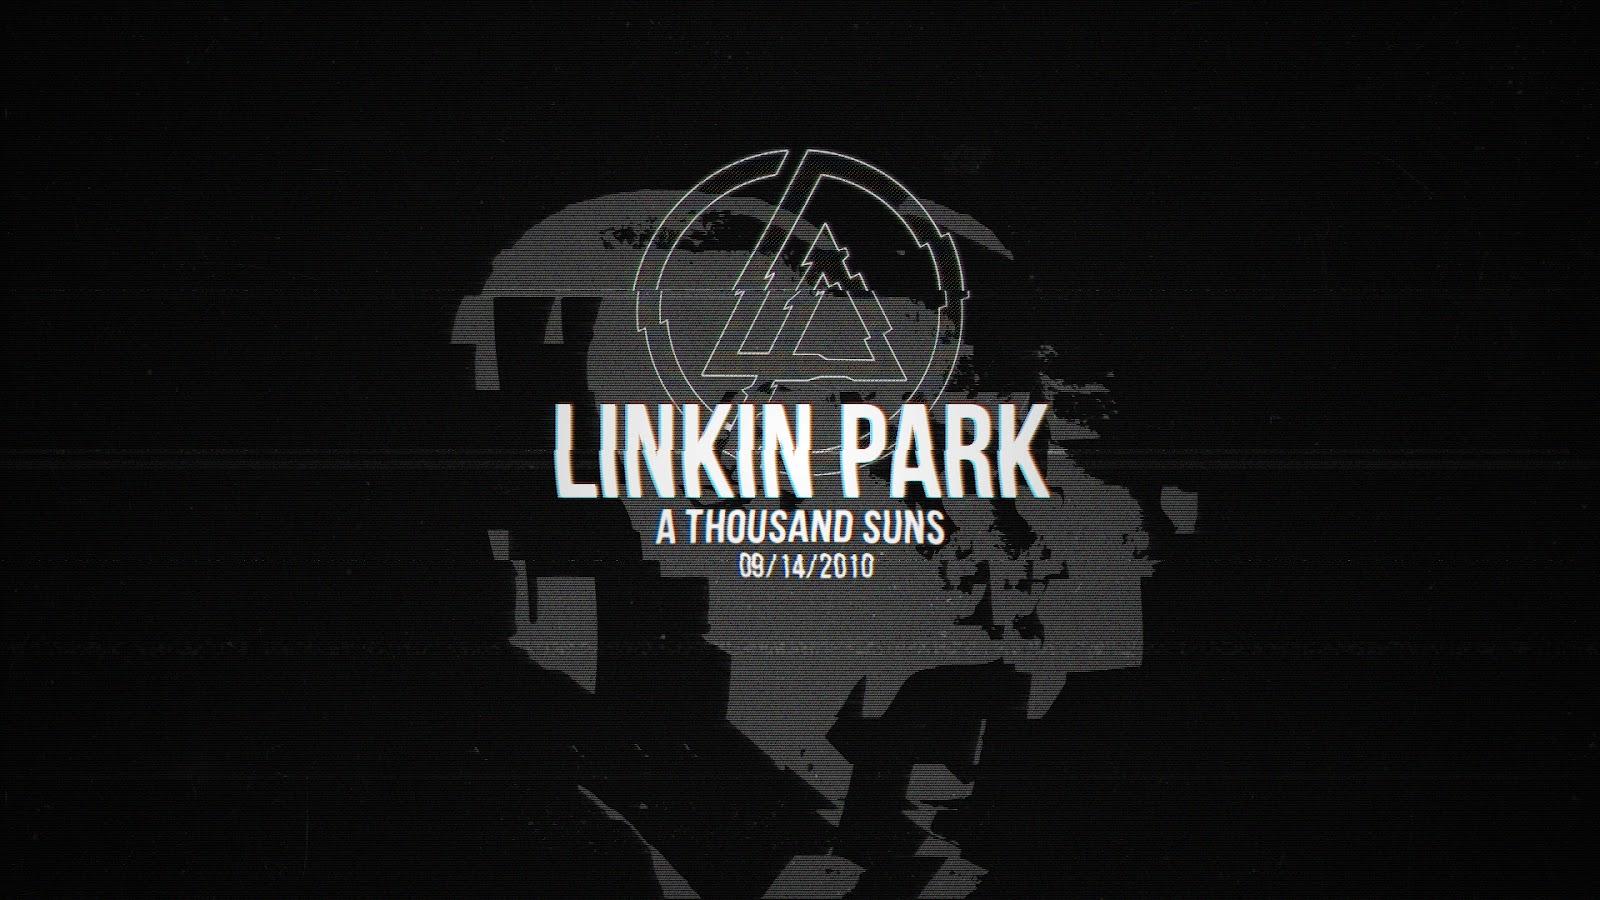 Bleach Wallpapers Hd 1080p Wallpapers Hd Linkin Park Banda De Rock Wallpapers De La